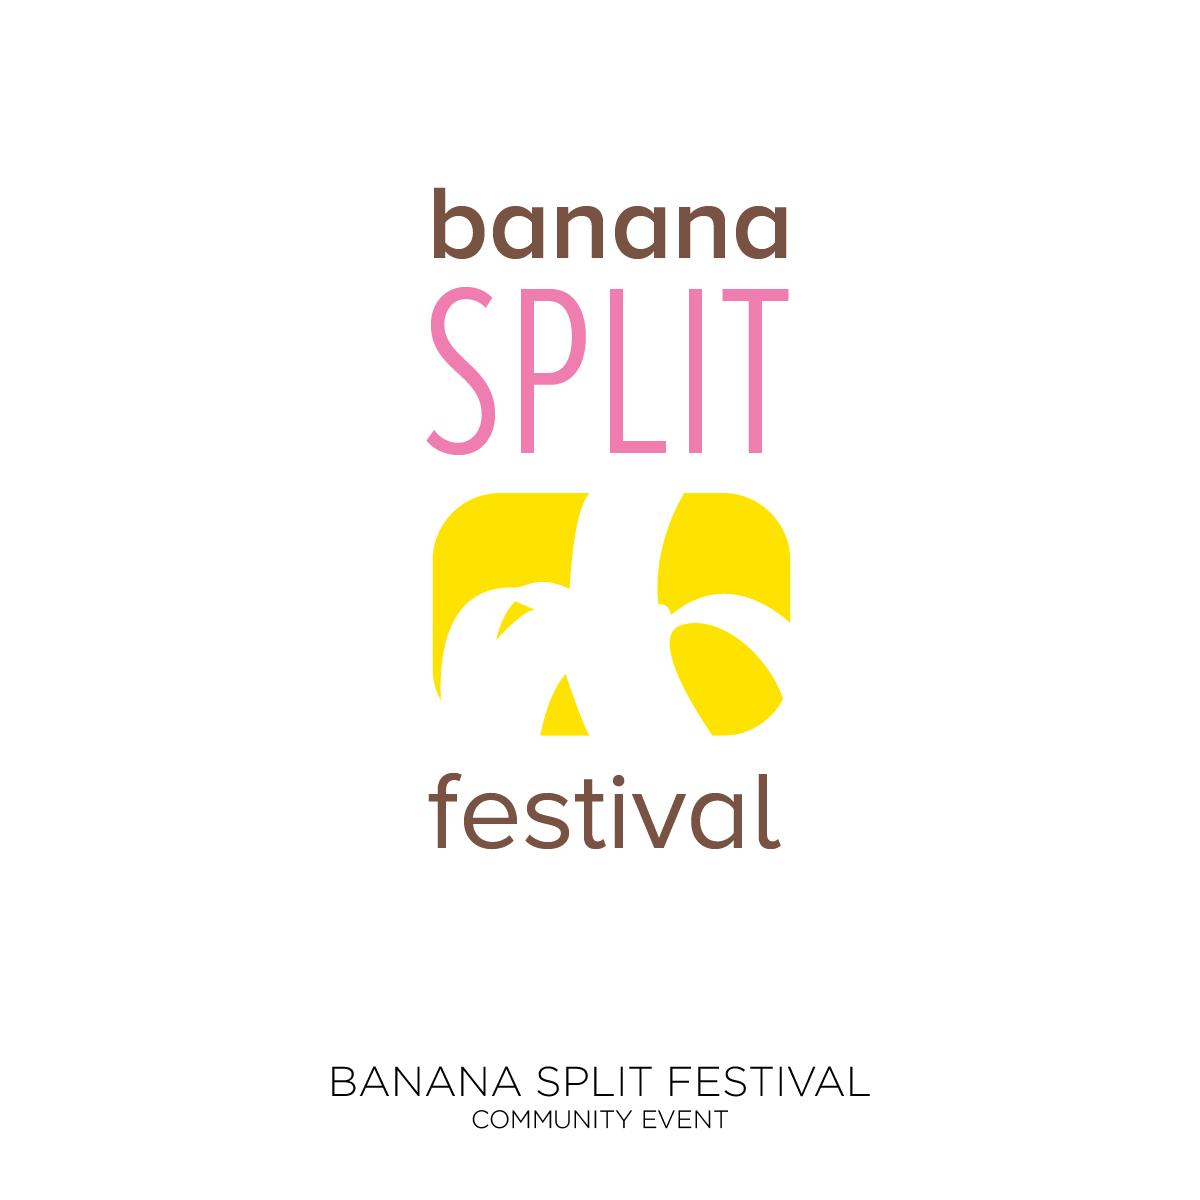 Banana split logo-01.png